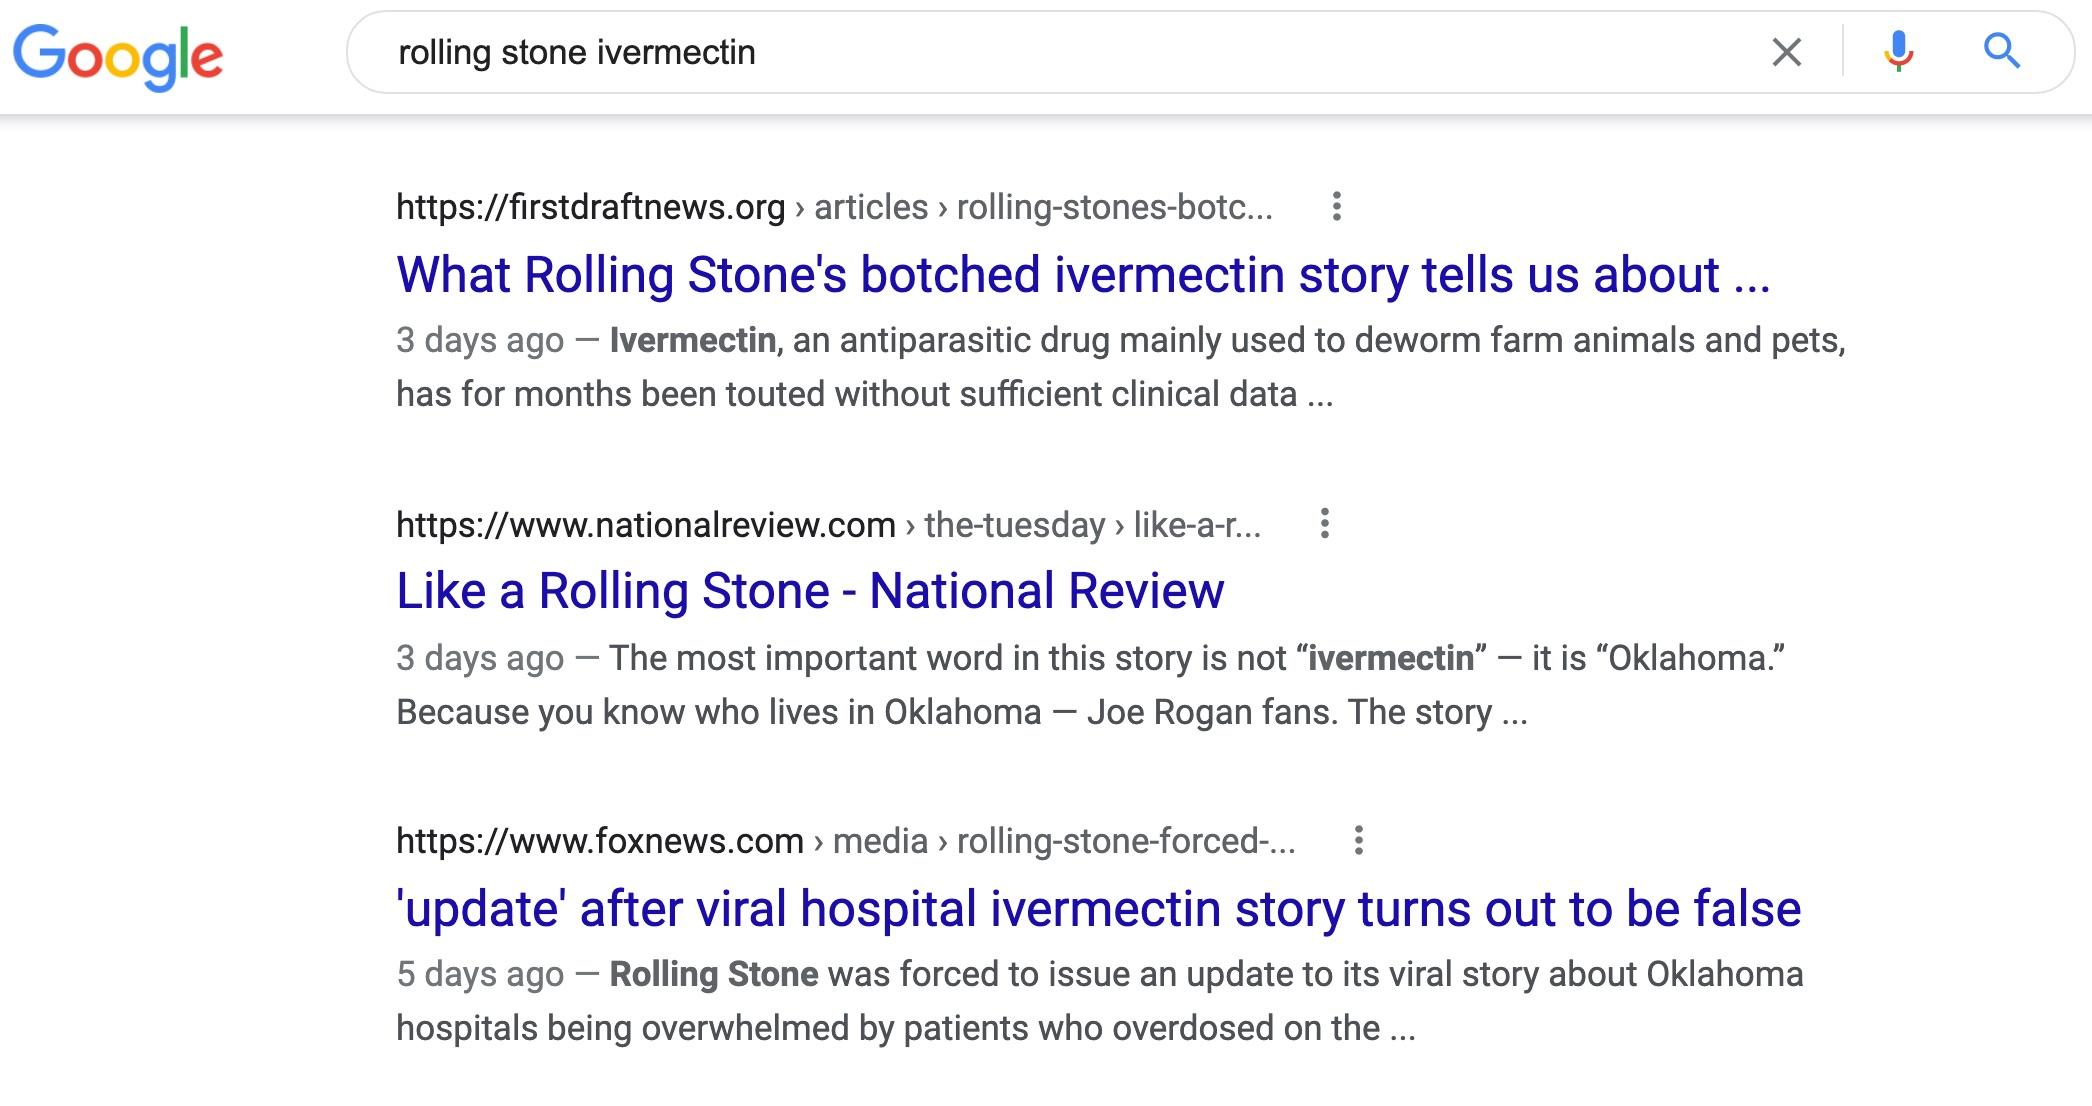 rolling stone ivermectin